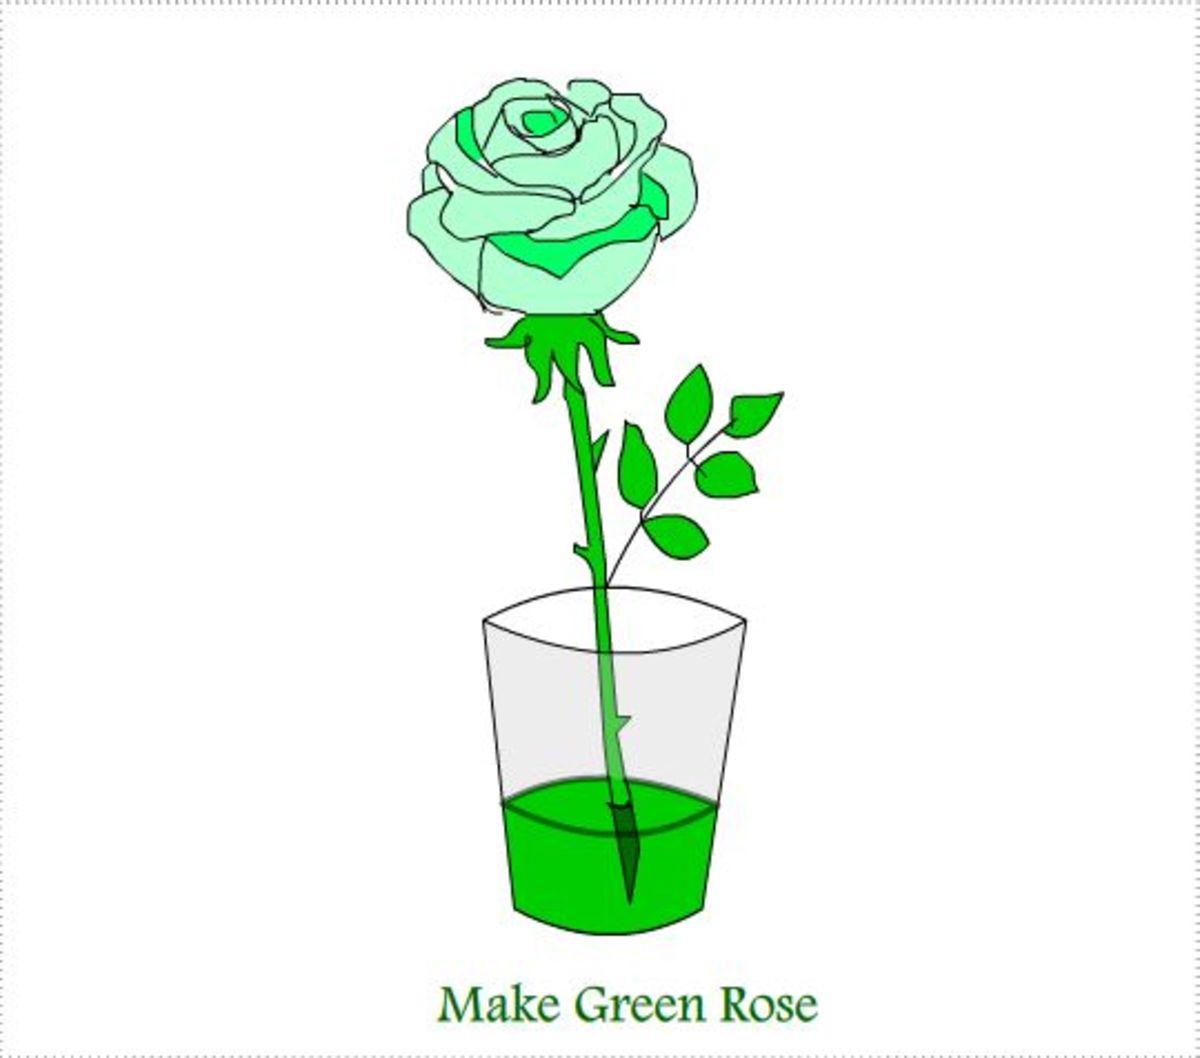 Make Green Roses